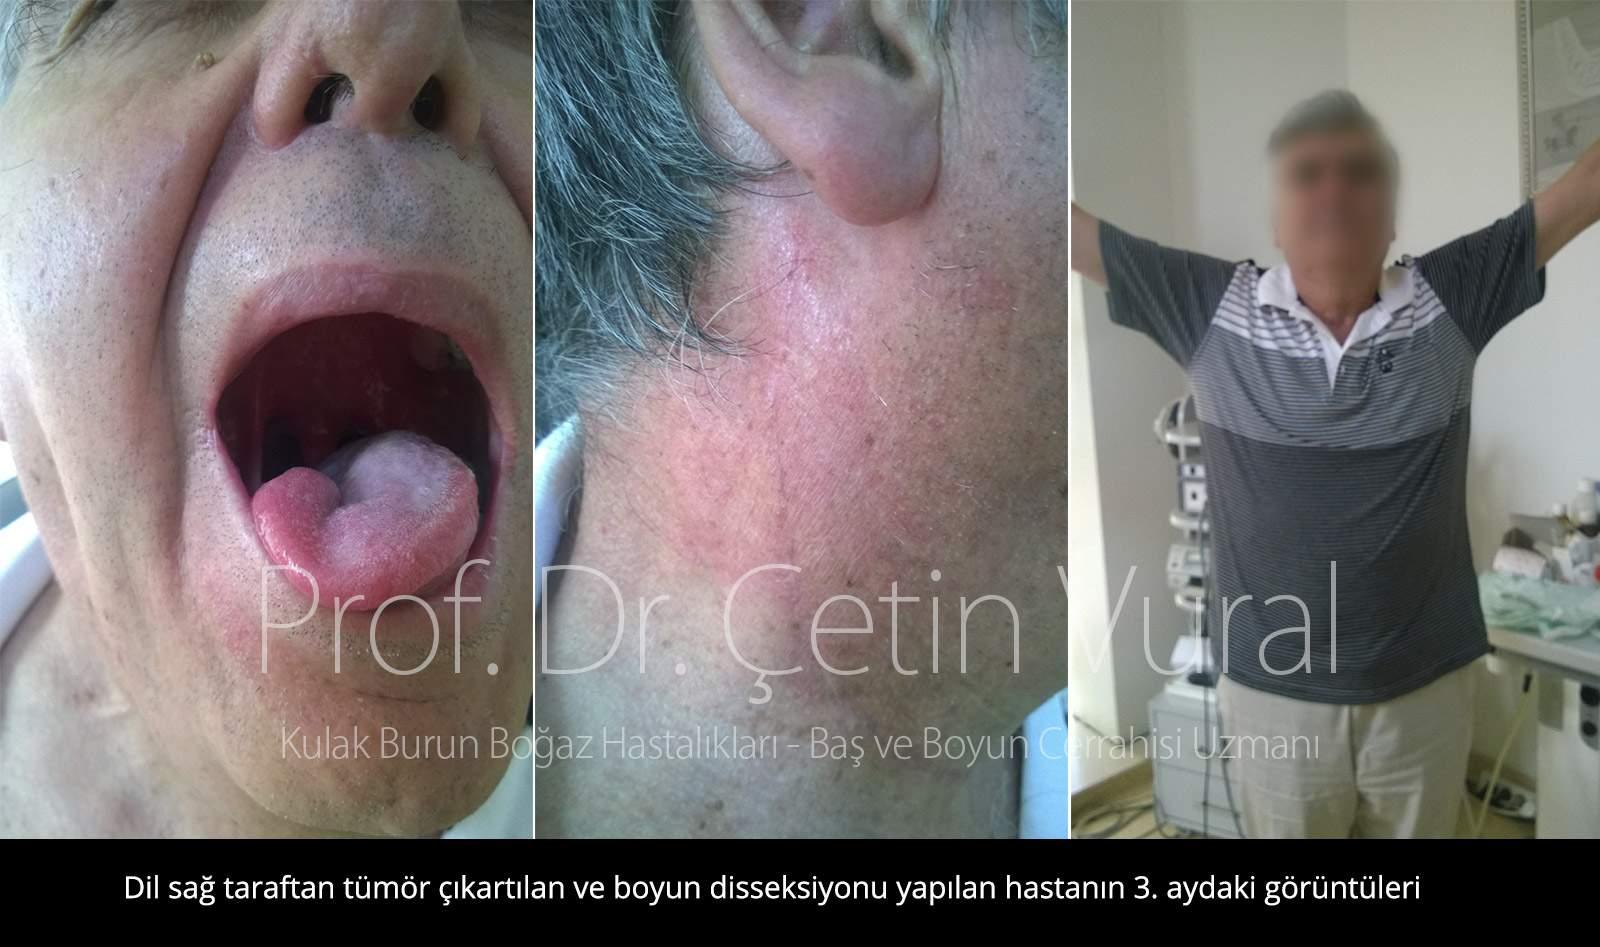 Dil Sağ Taraf Post Op Kontrol - Prof. Dr. Çetin Vural